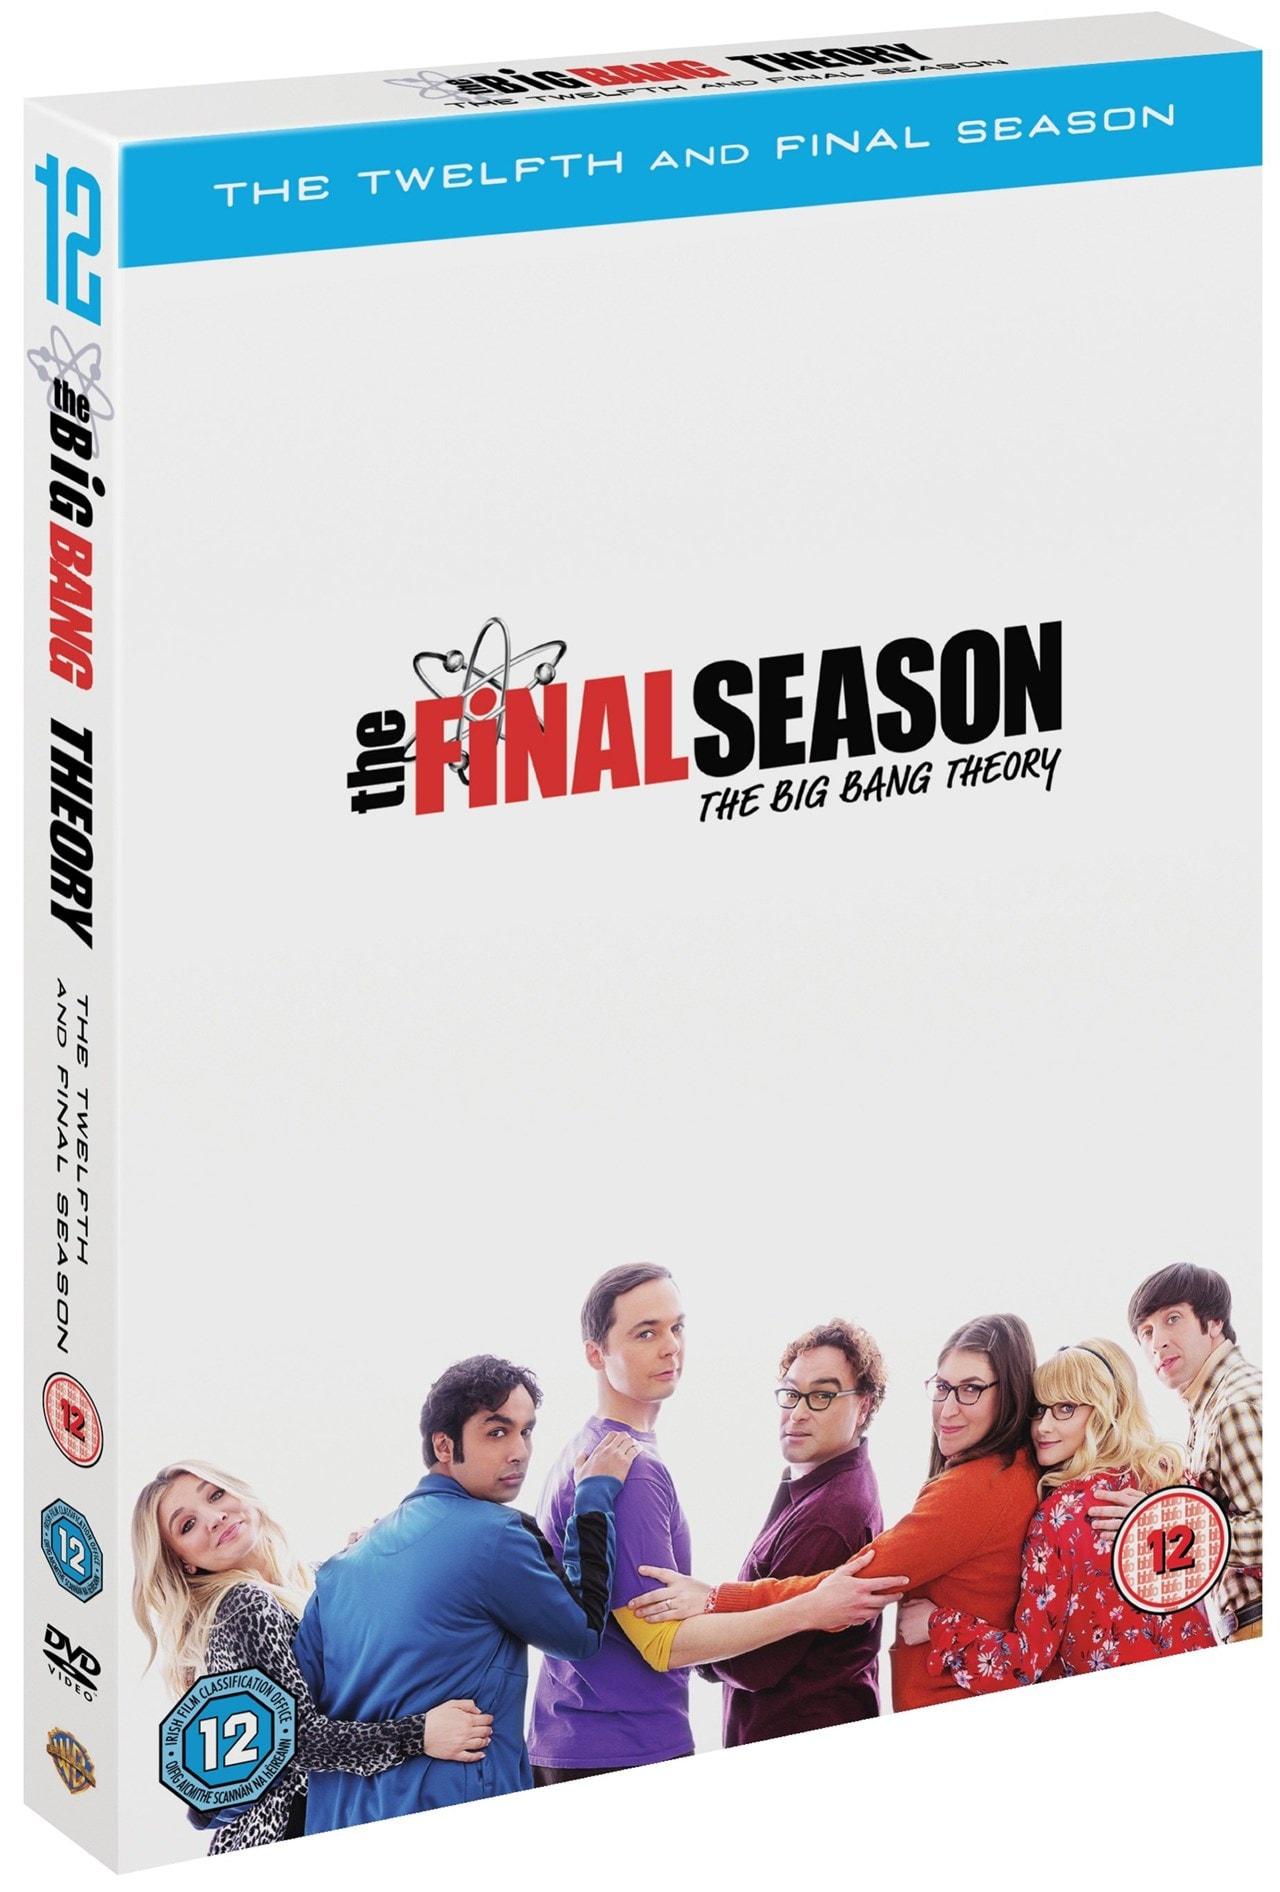 The Big Bang Theory: The Twelfth and Final Season - 2